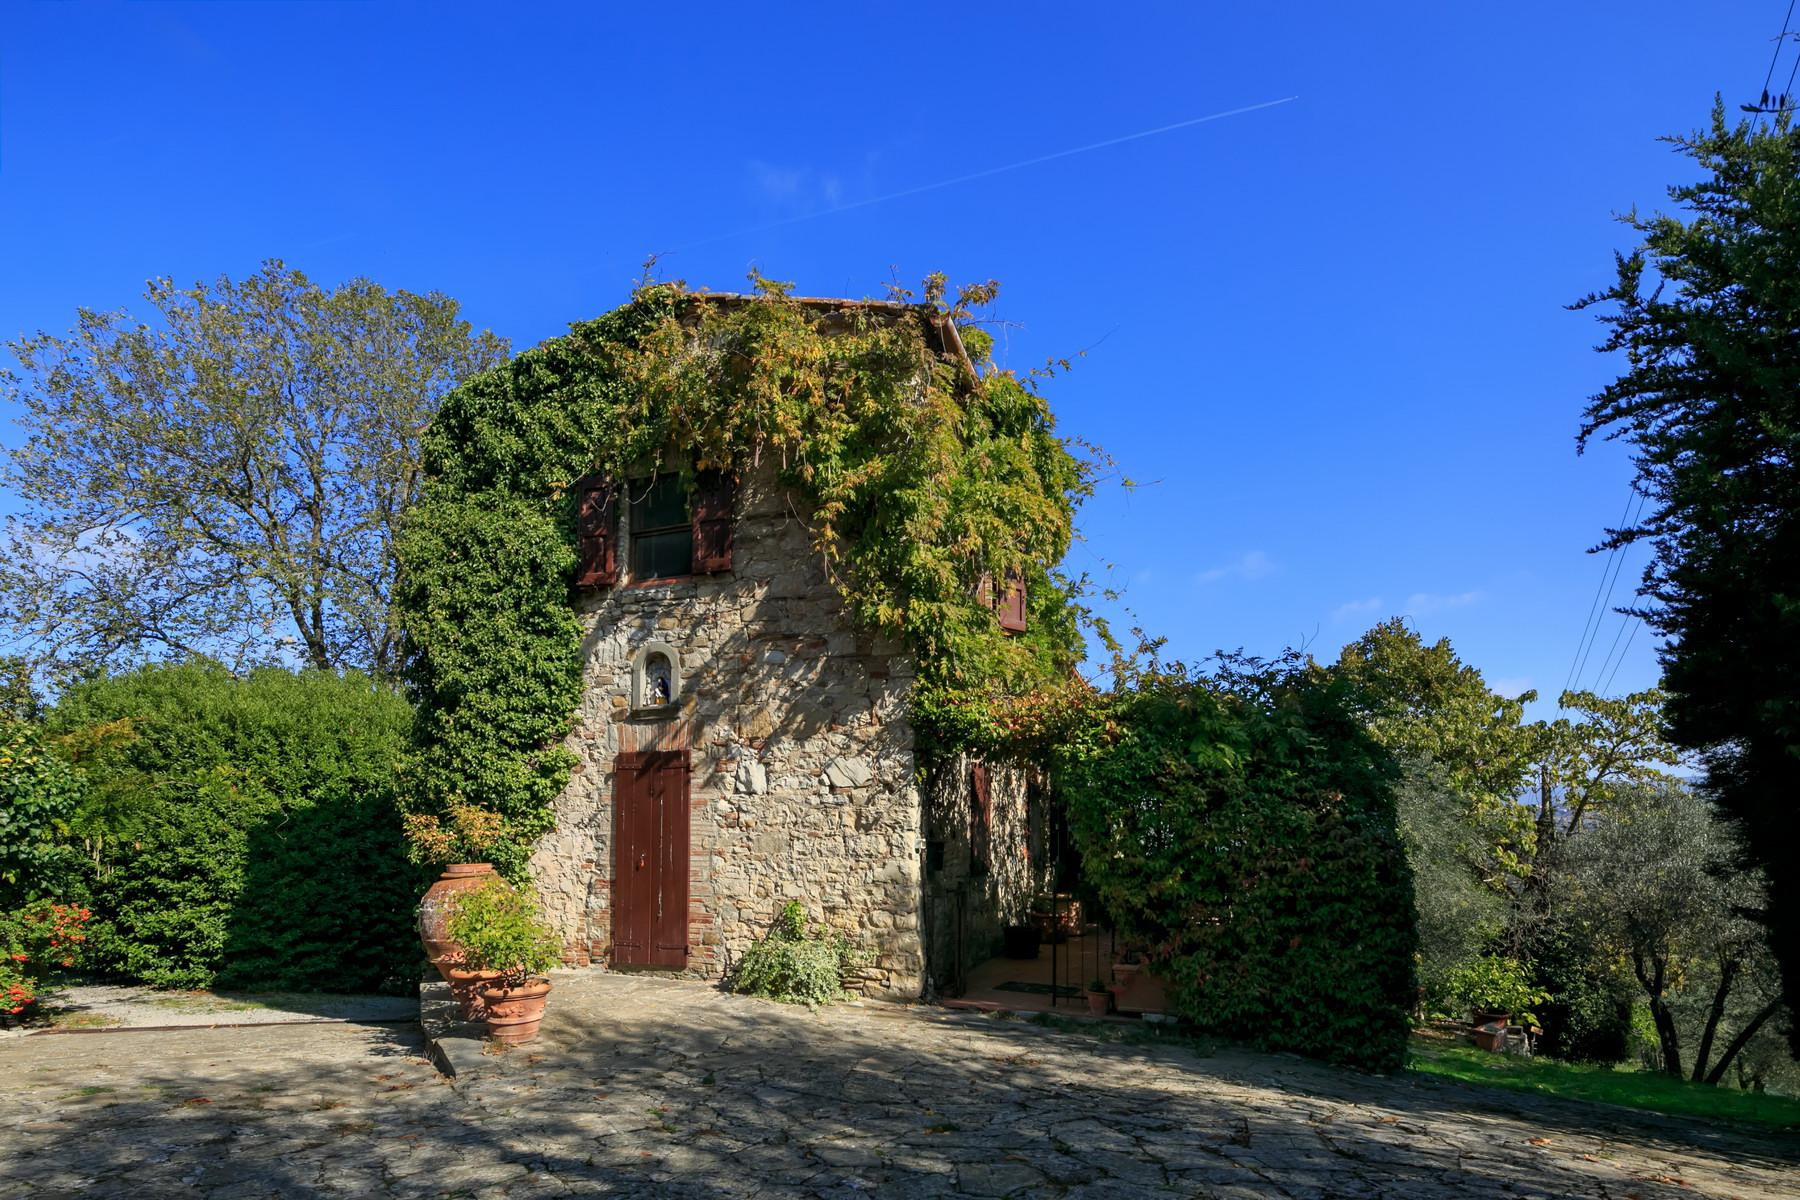 Rustico in Vendita a Castellina In Chianti: 5 locali, 720 mq - Foto 11